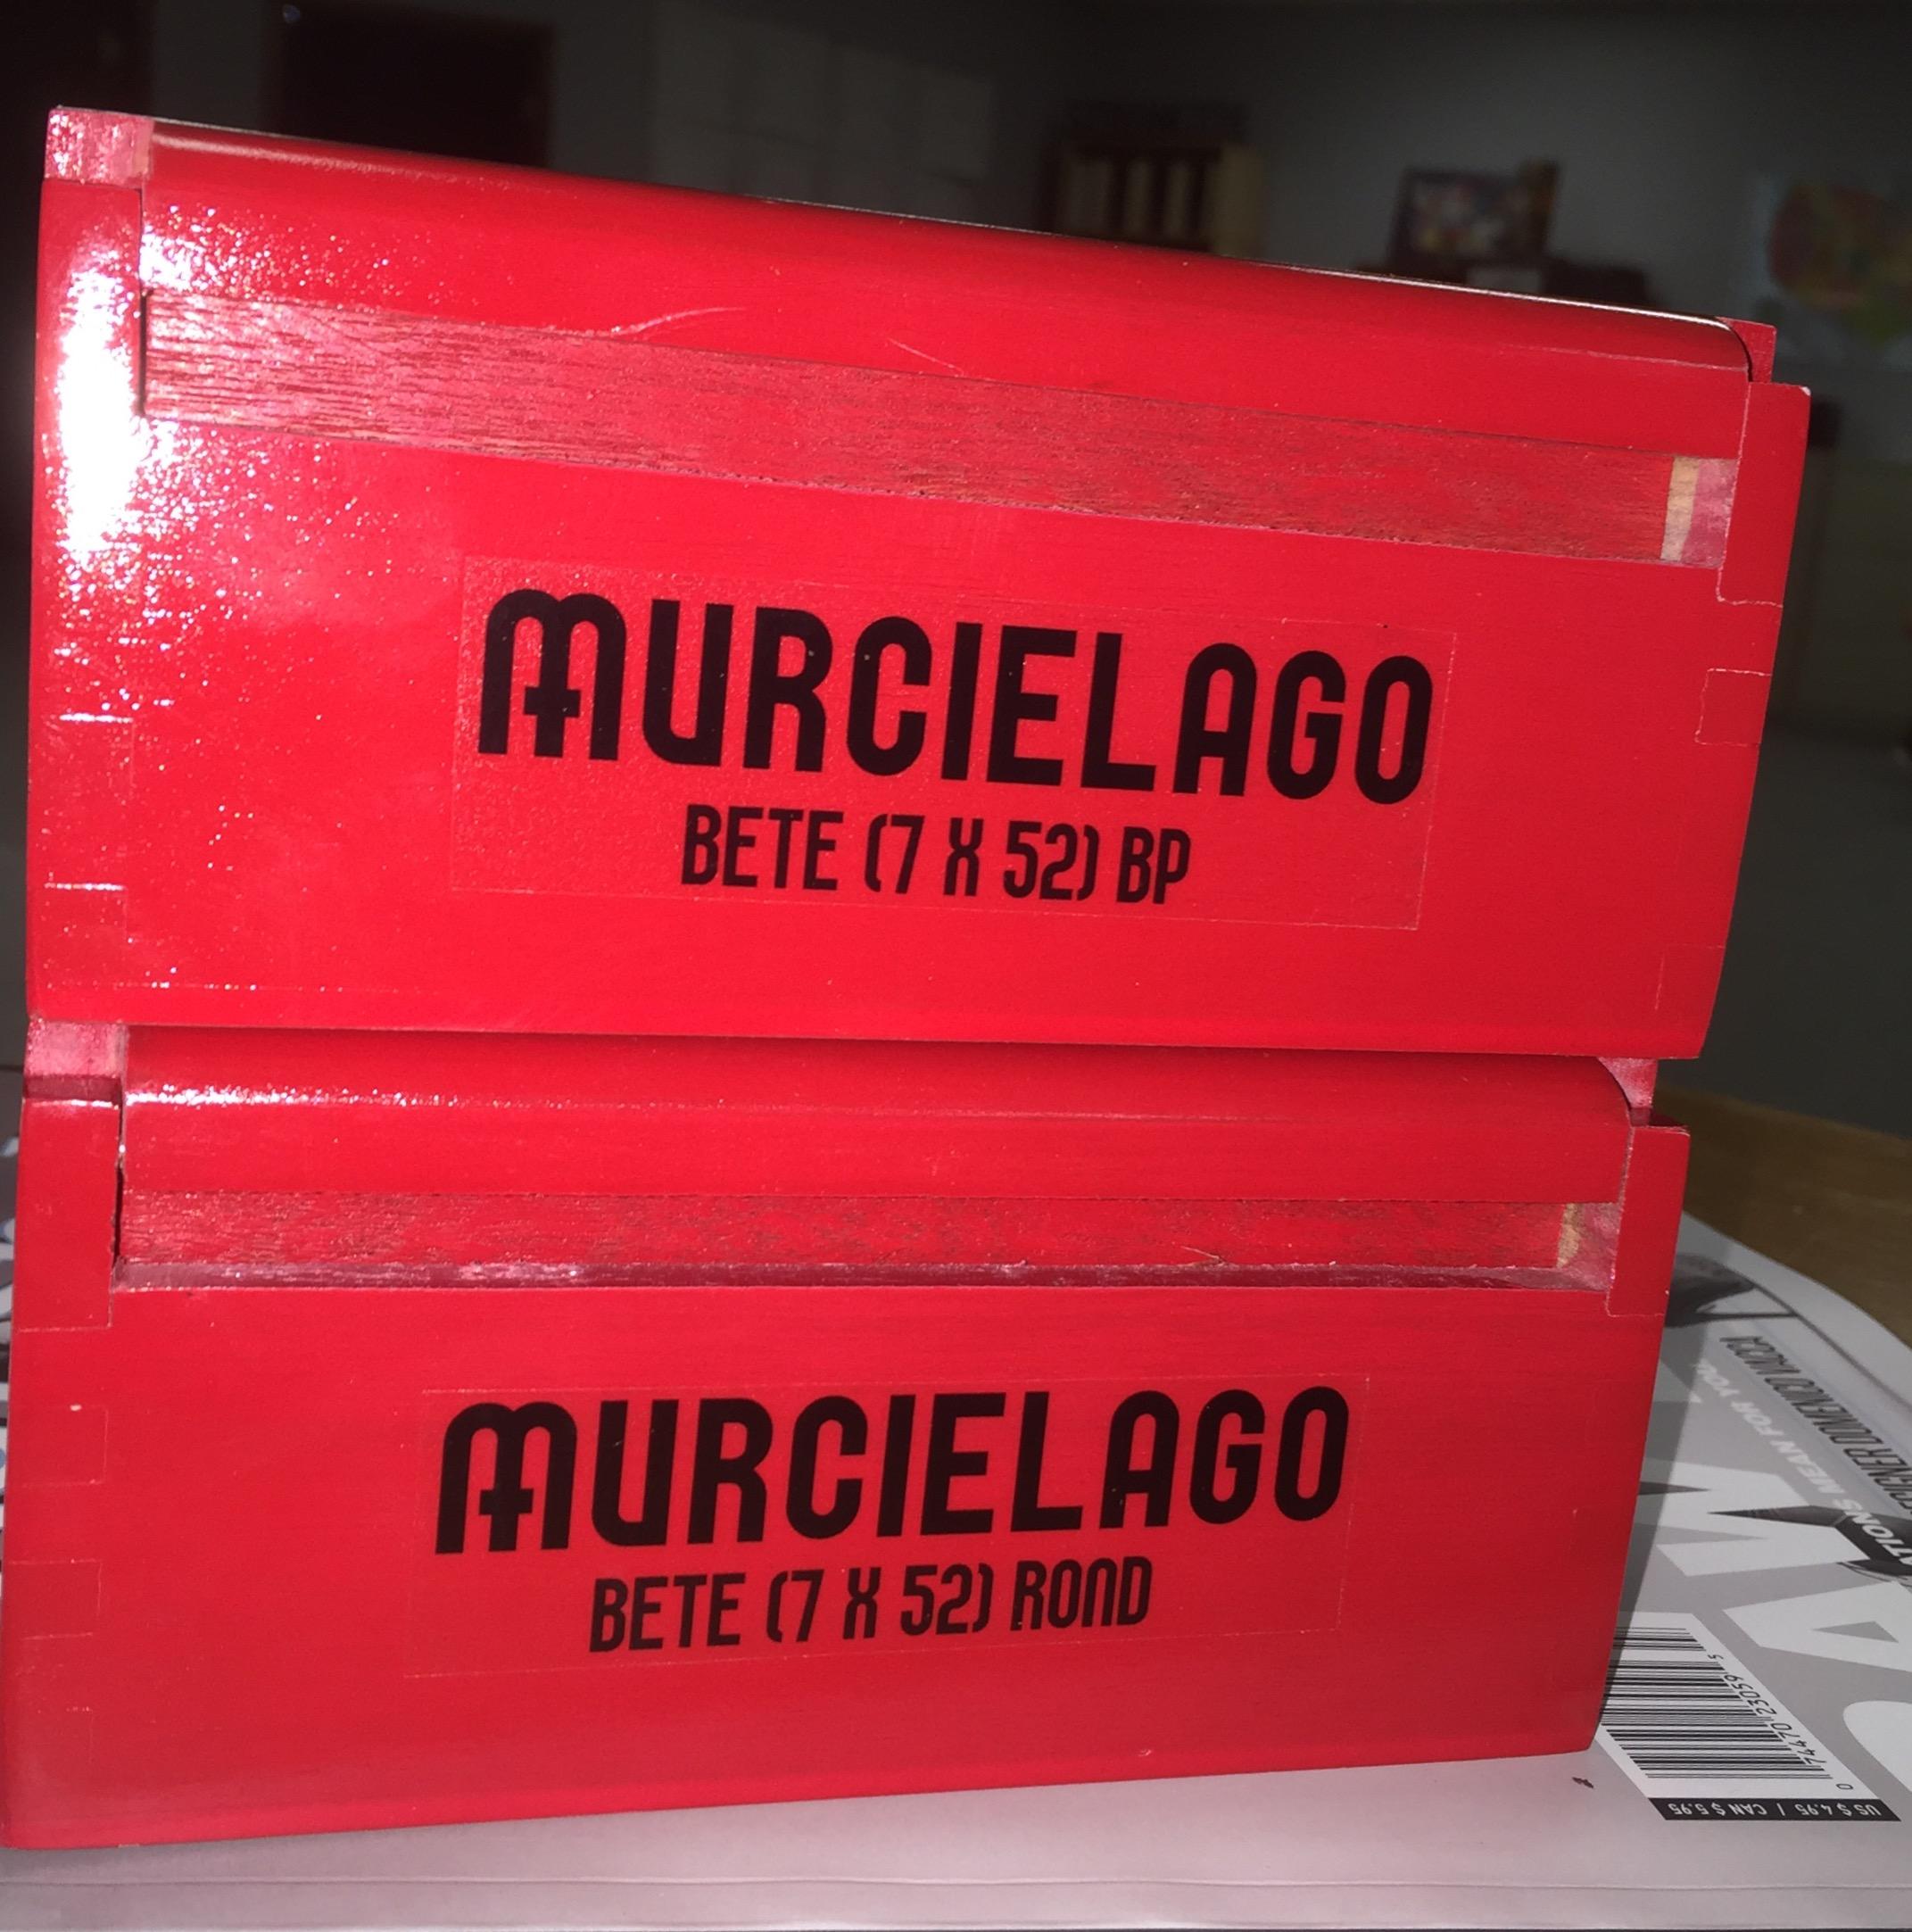 Cigar News: Espinosa Cigars Adding Murcielago Bête BP and Rond